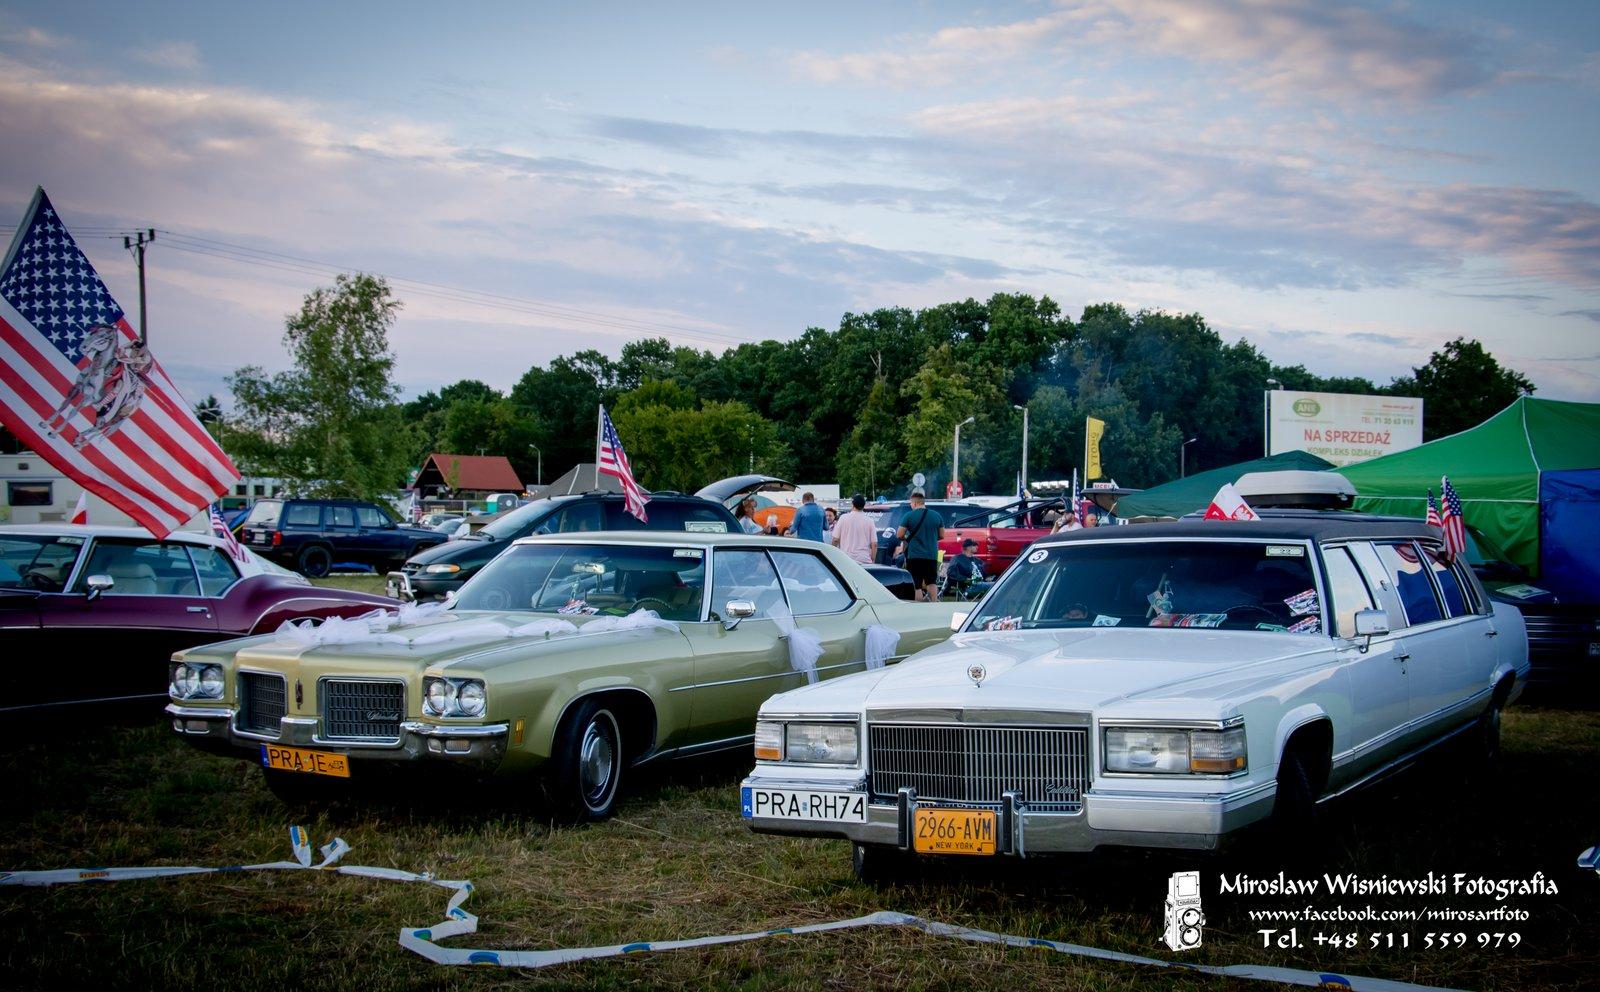 Miroslaw Wisniewski , American Cars Mania 2017